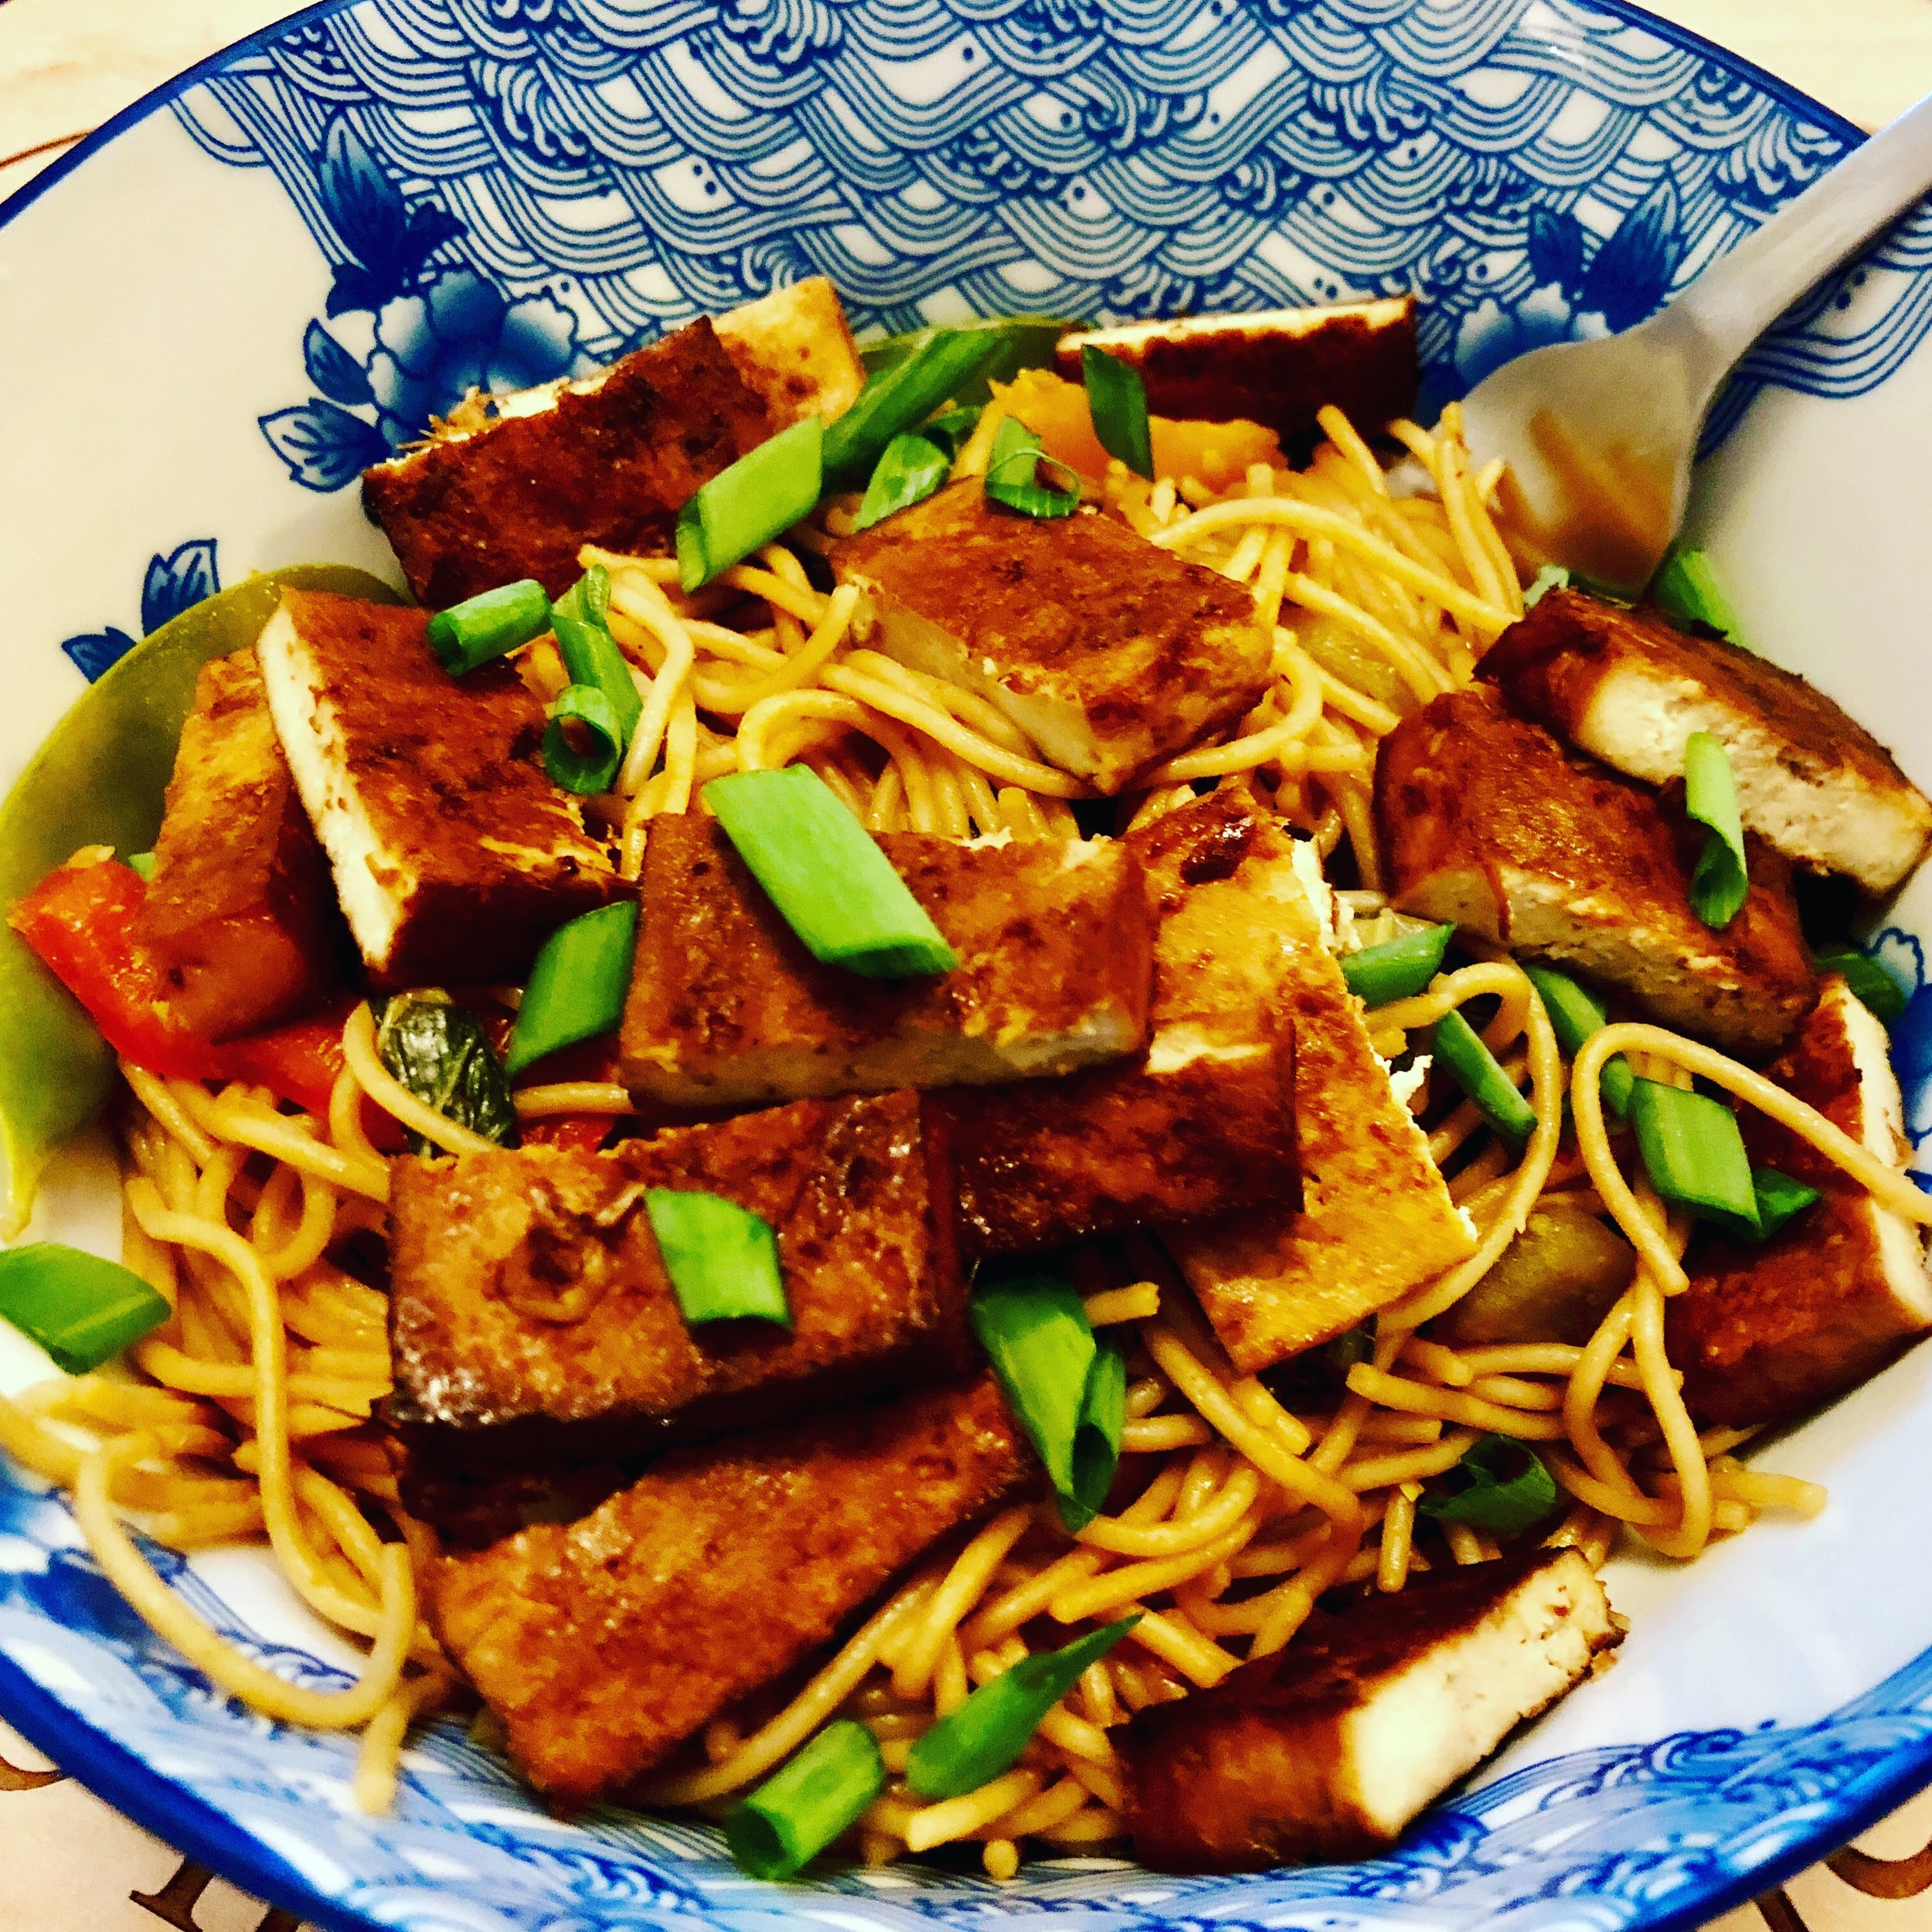 Tofu Chow Mein Photo credit: Alyssa DelSoldato